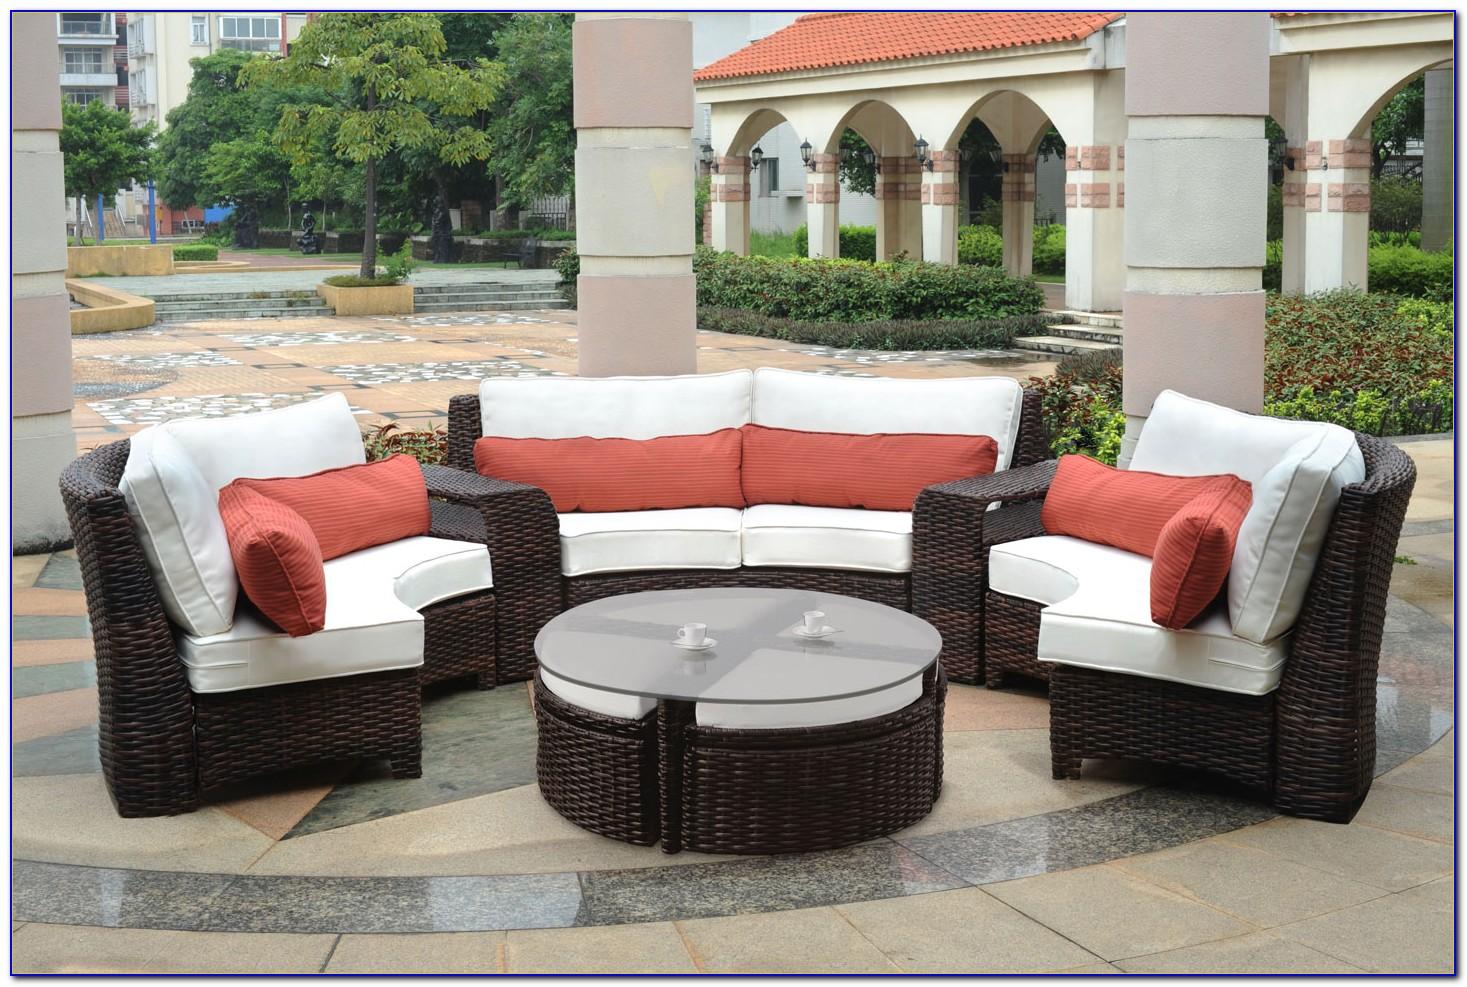 Honeylane Wicker Patio Sectional Sofa Furniture Collection